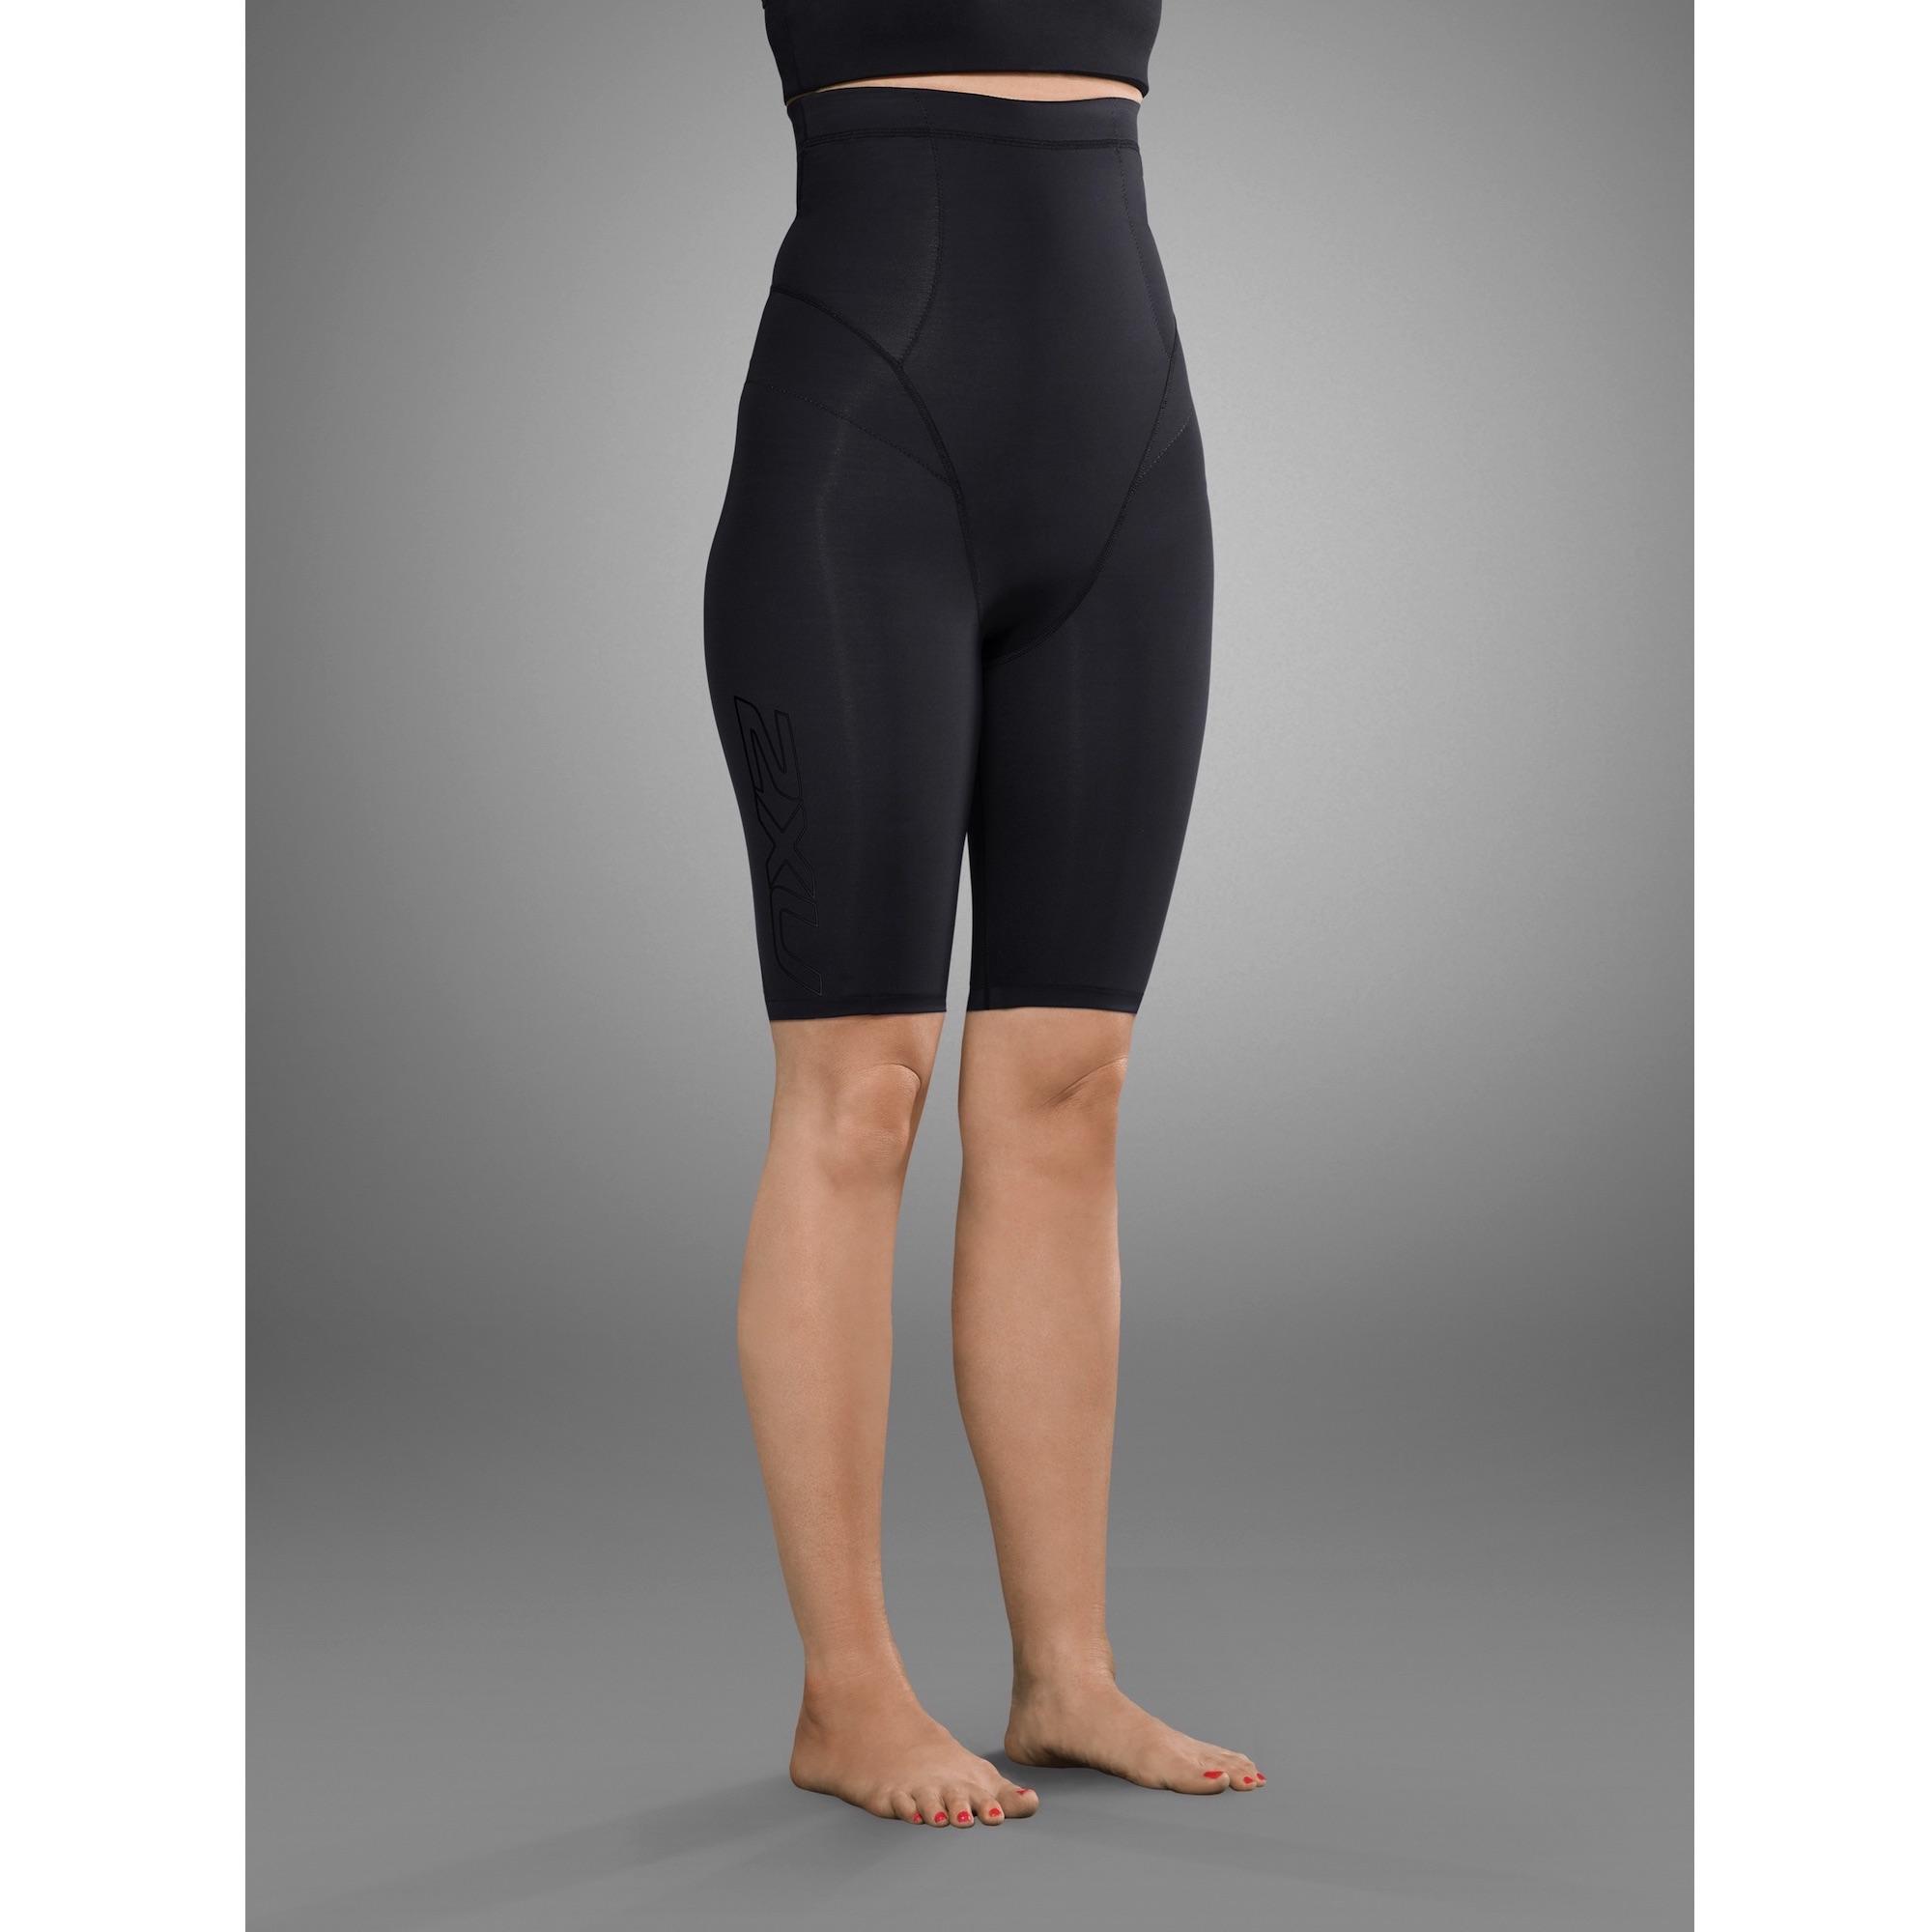 2XU Postnatal recovery shorts